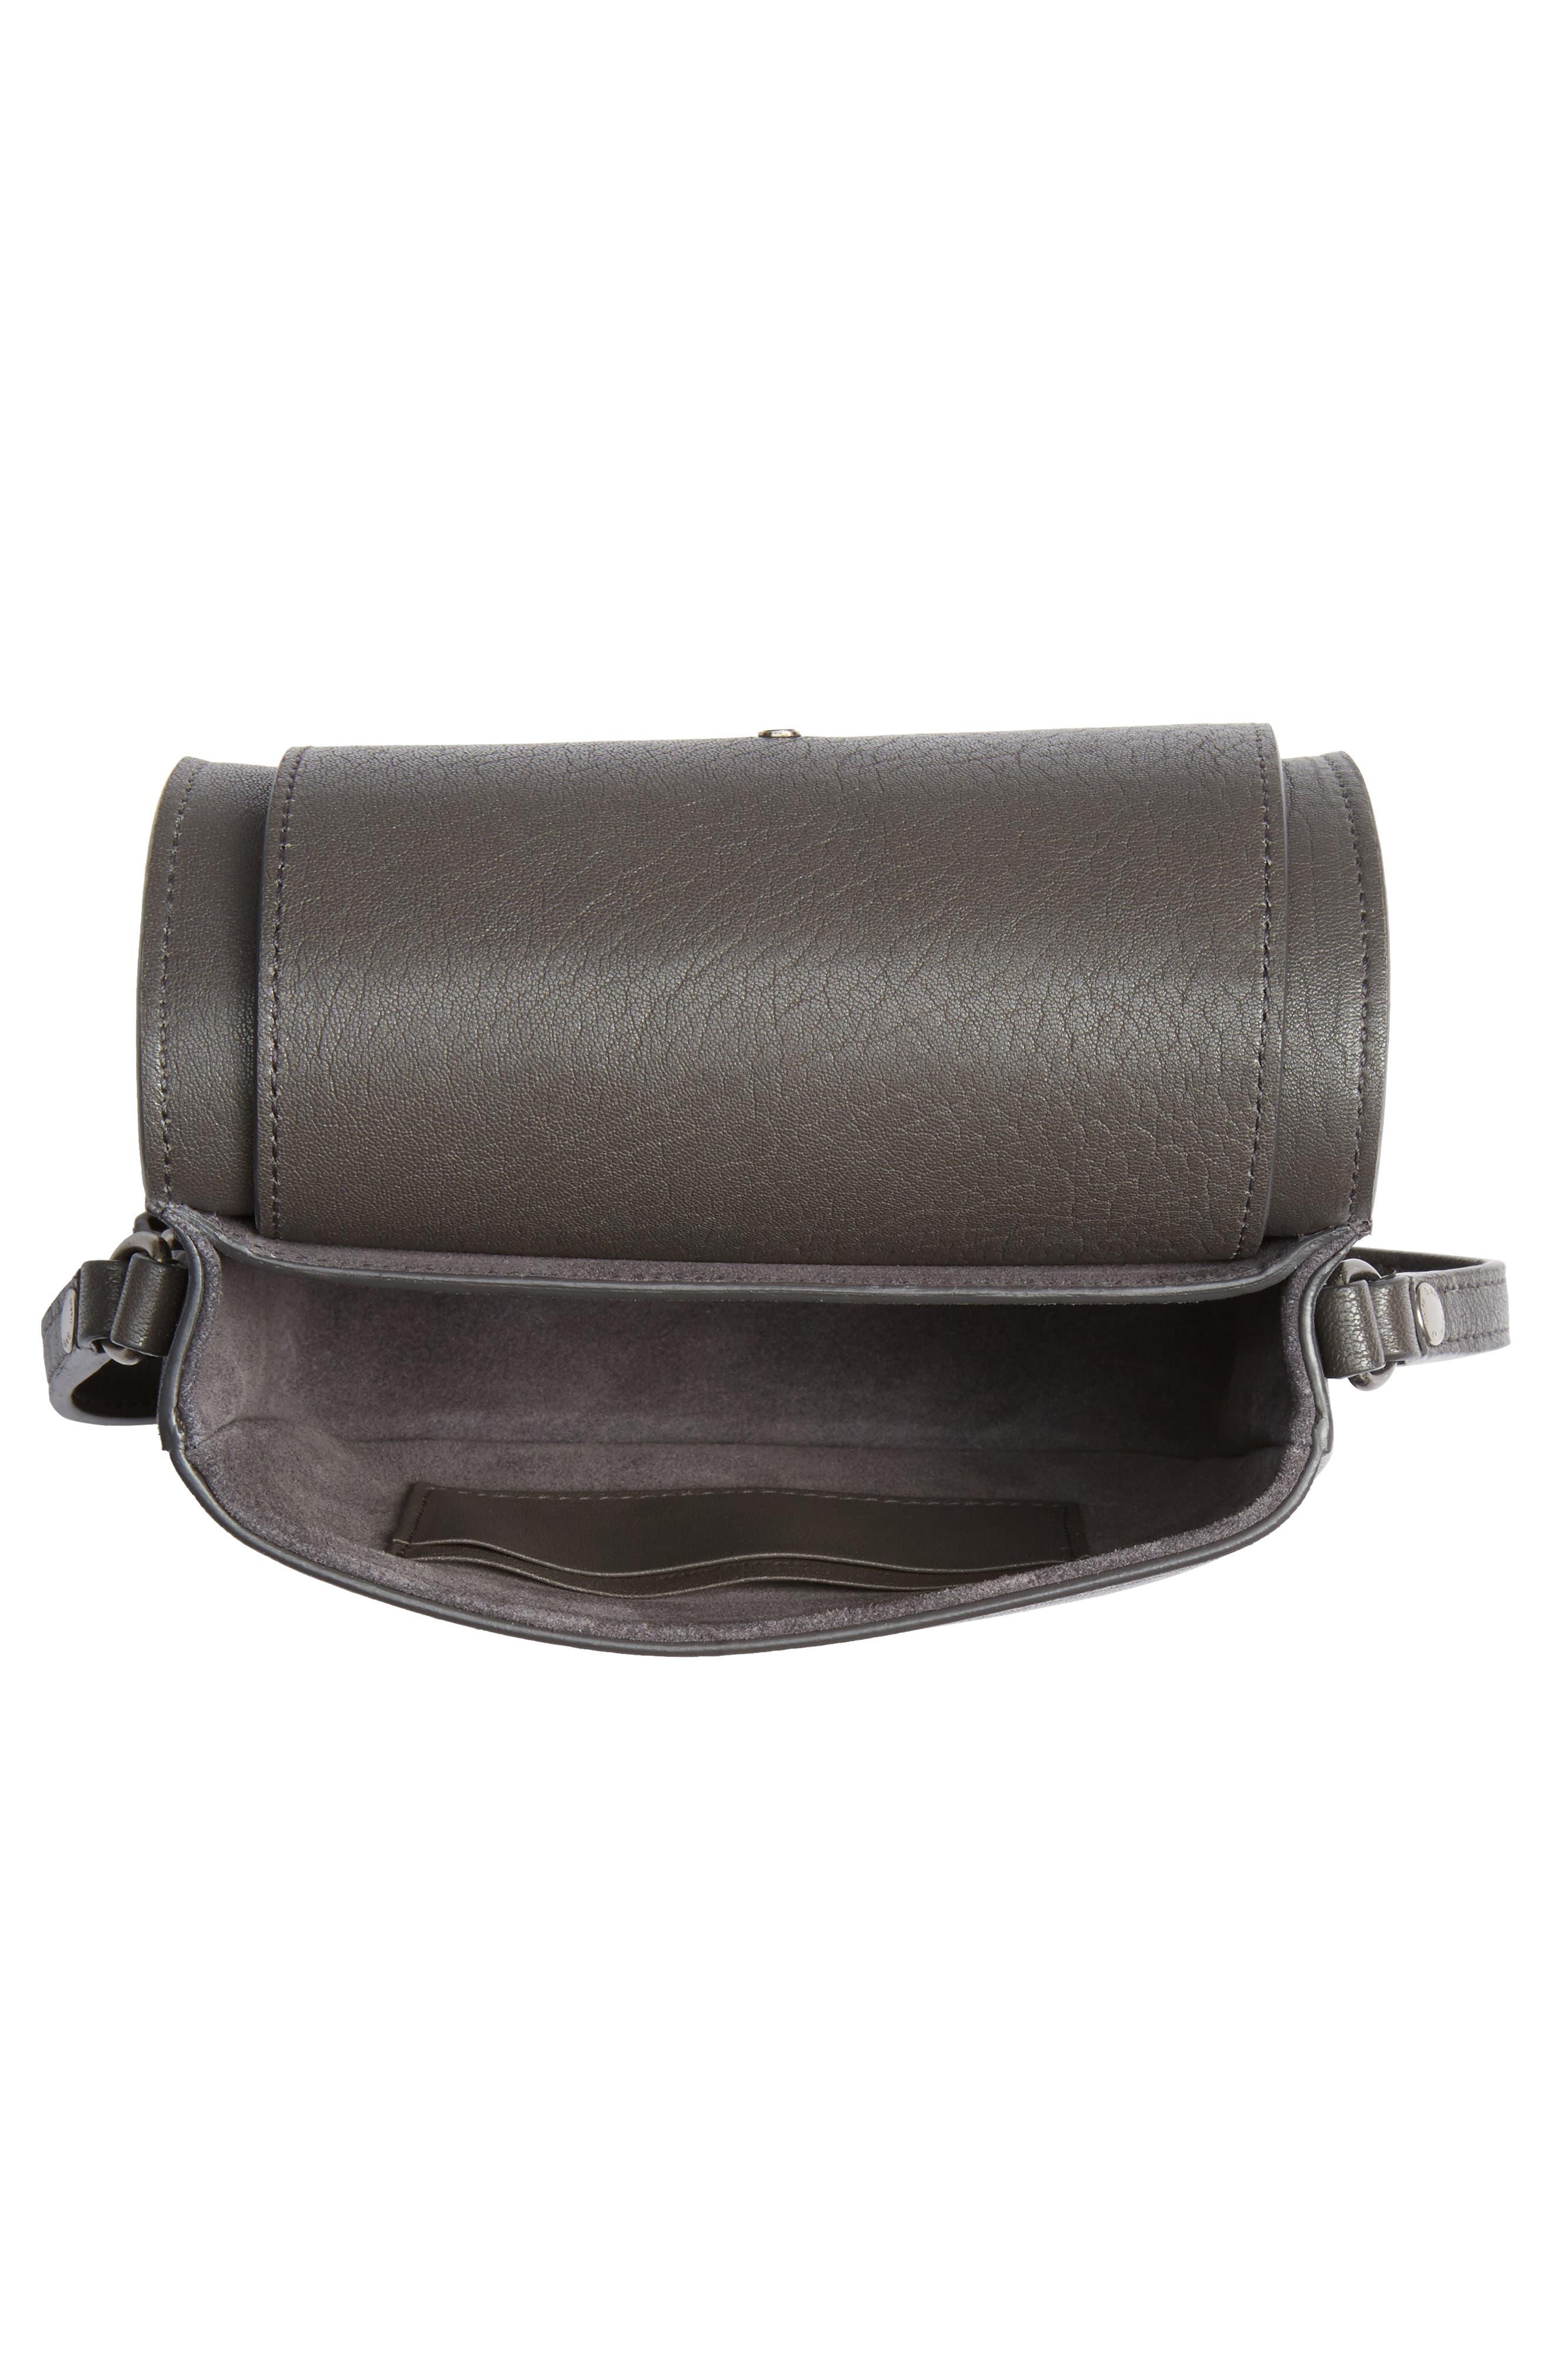 Calfskin Leather Crossbody Bag,                             Alternate thumbnail 3, color,                             Asphalt